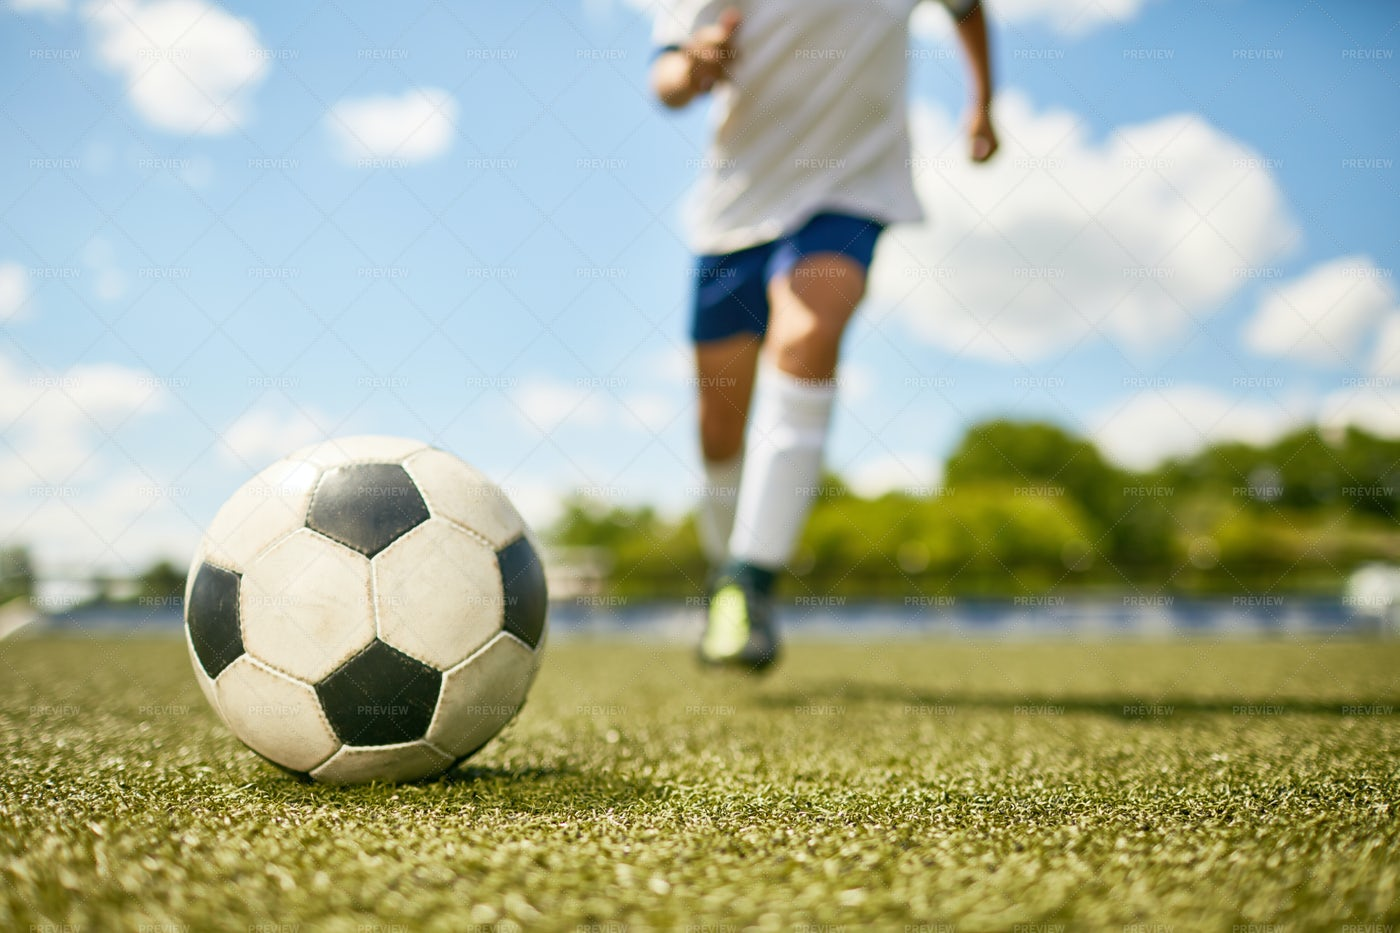 Boy Kicking Ball In Football Field: Stock Photos